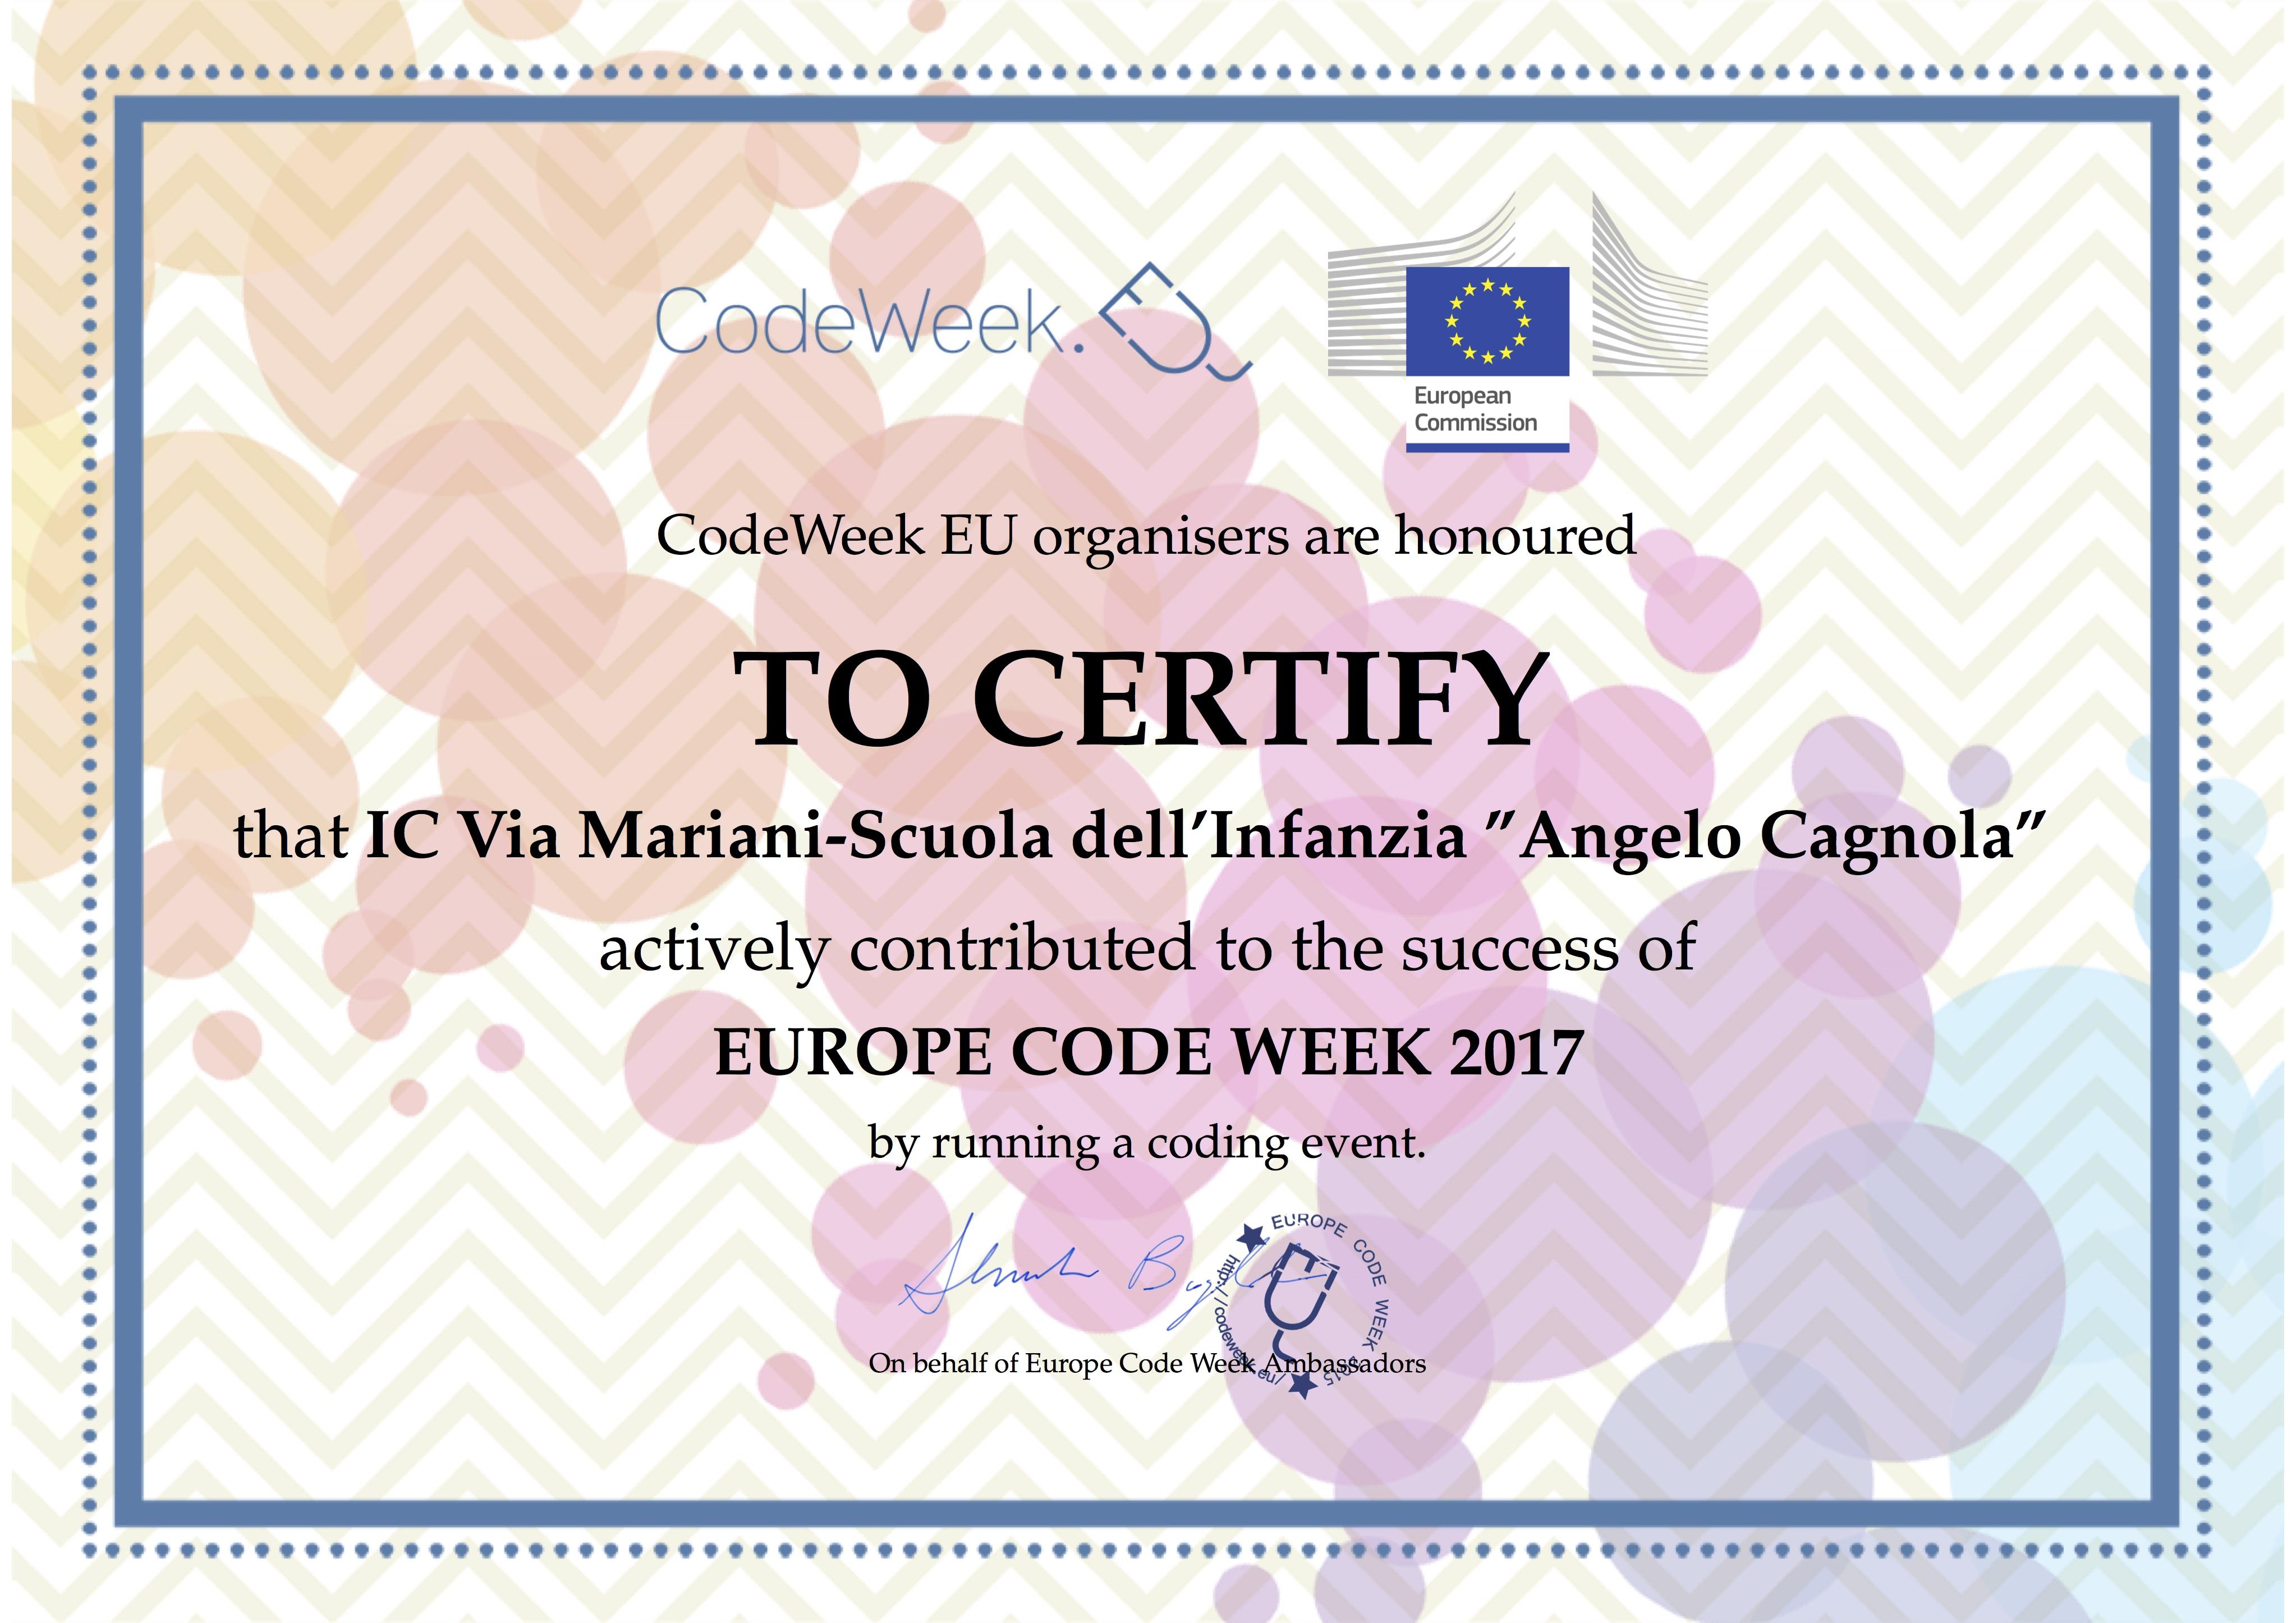 Attestato CodeWeek 2017 Cagnola